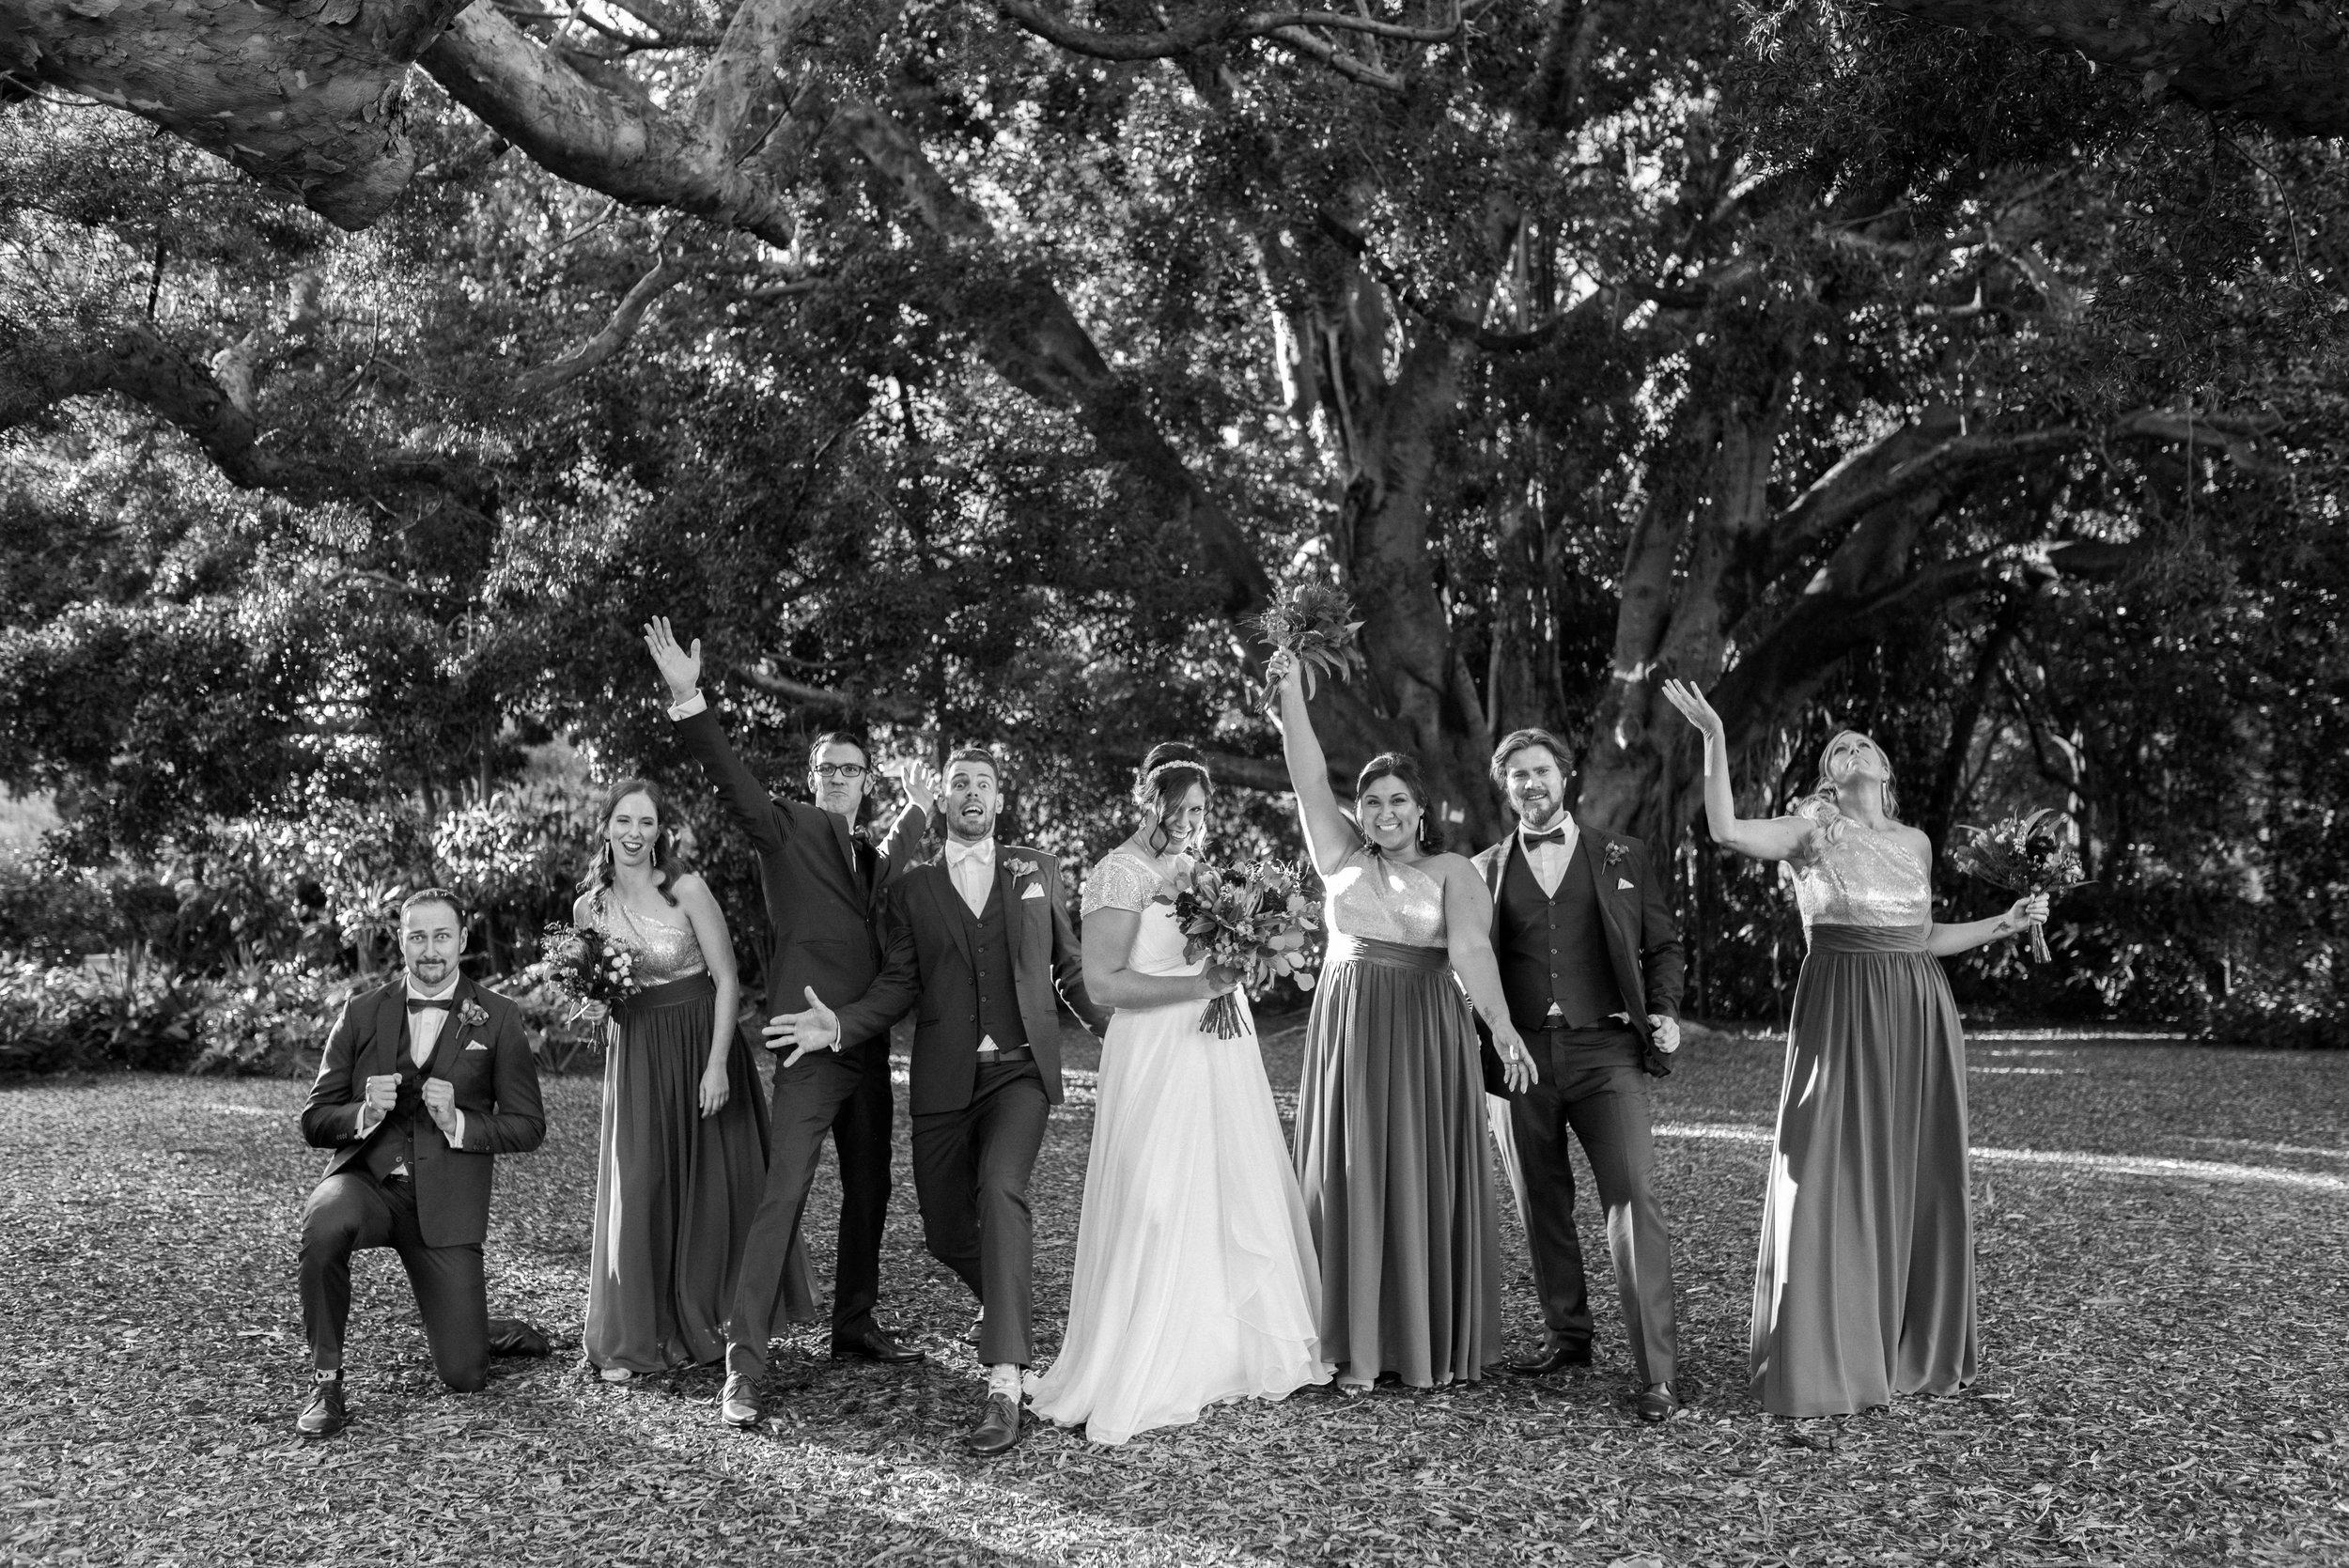 brisbane-city-wedding-photography-film-light-loft-westend-1-16.jpg